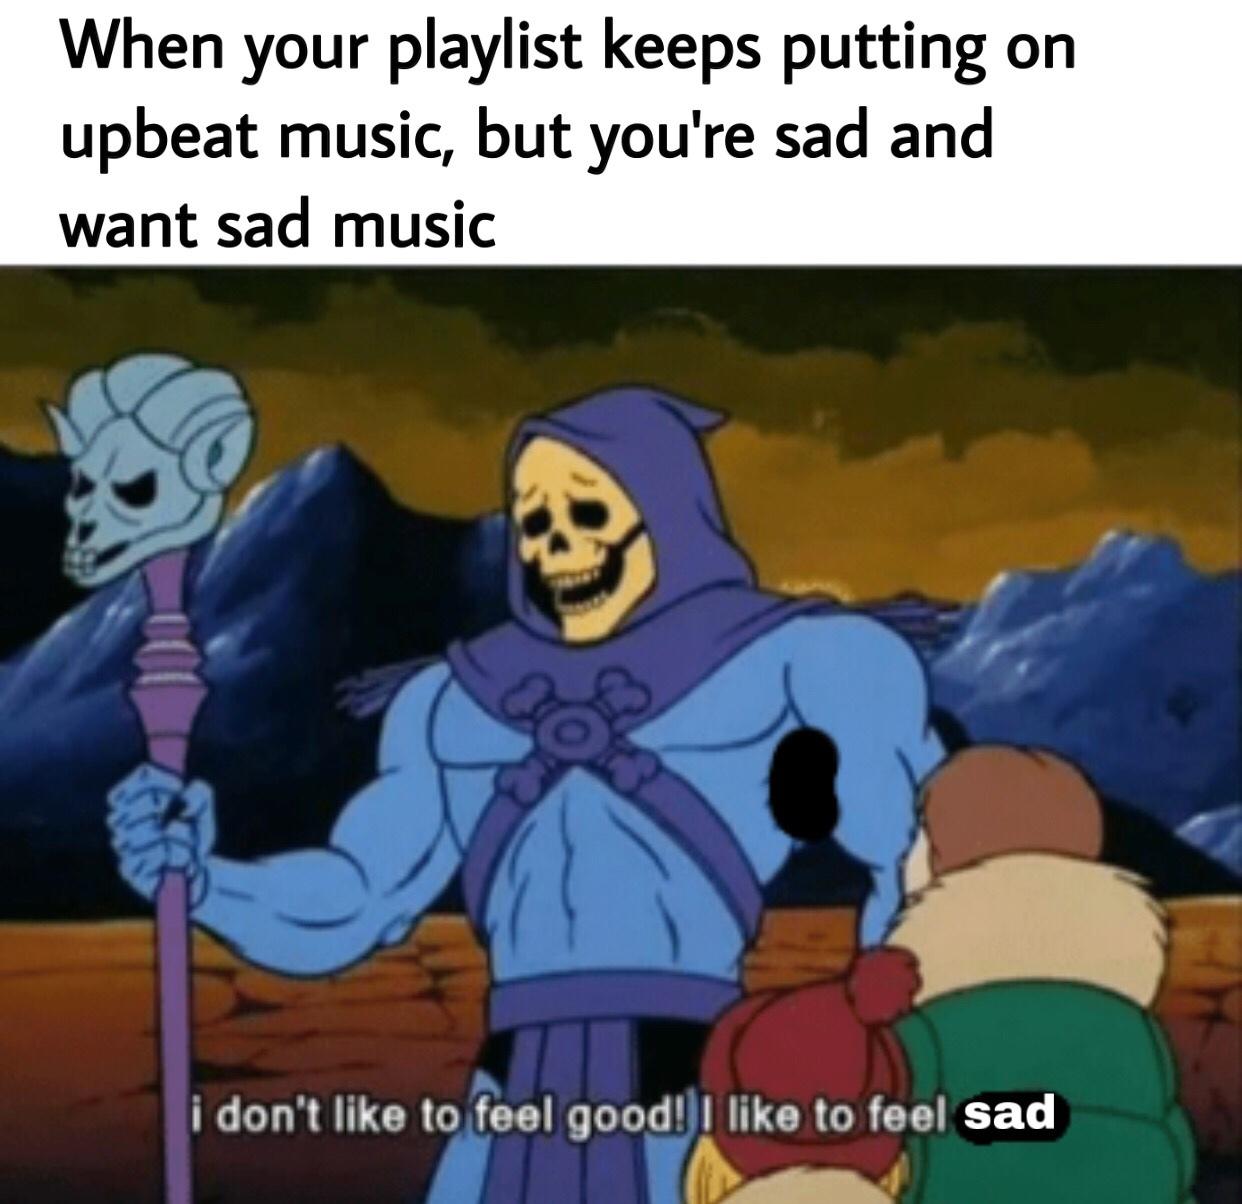 I like to feel sad :( - Meme by JackRocksOut :) Memedroid